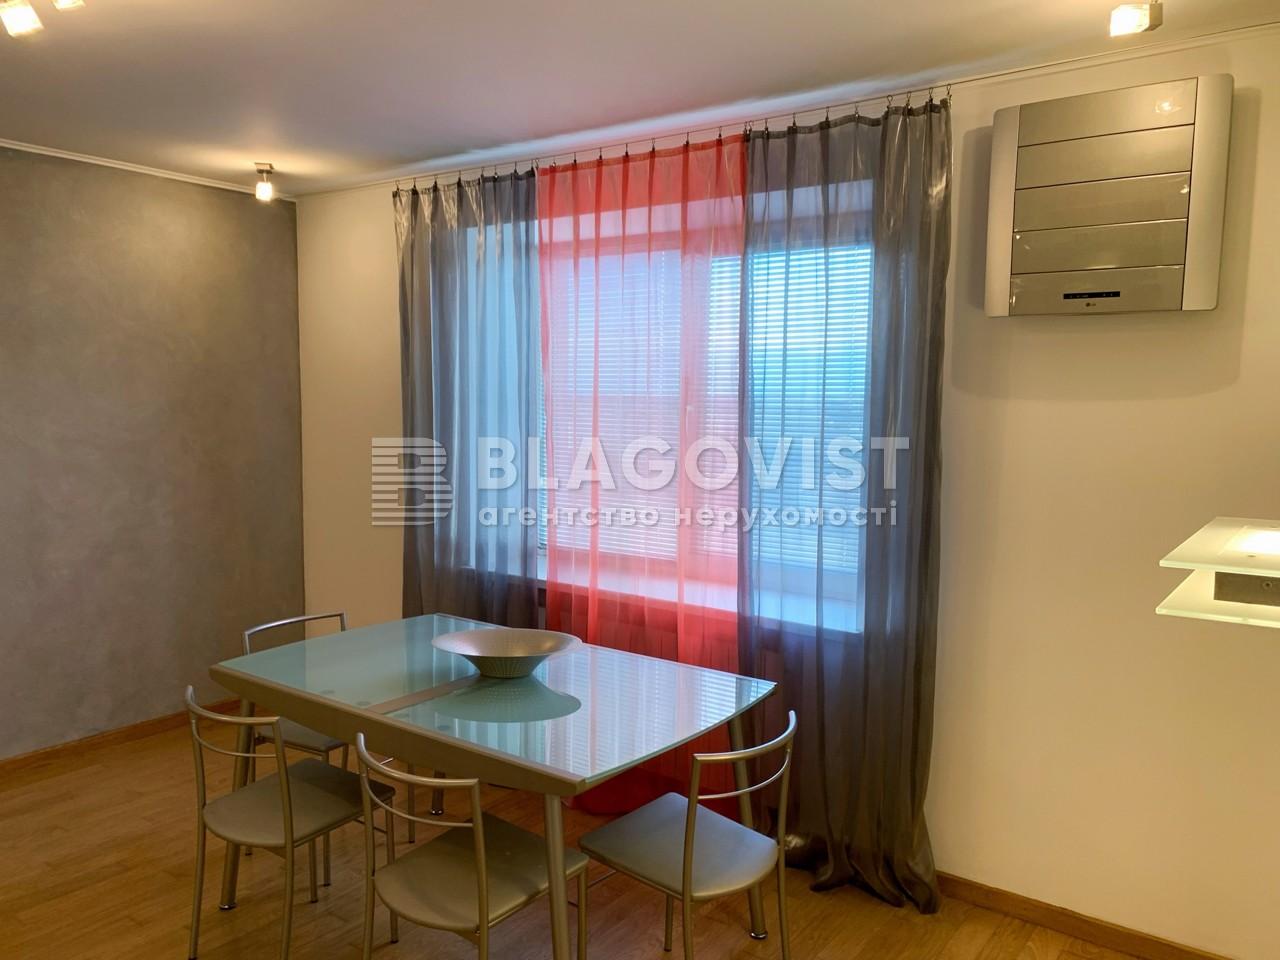 Квартира D-37389, Декабристов, 12/37, Киев - Фото 11